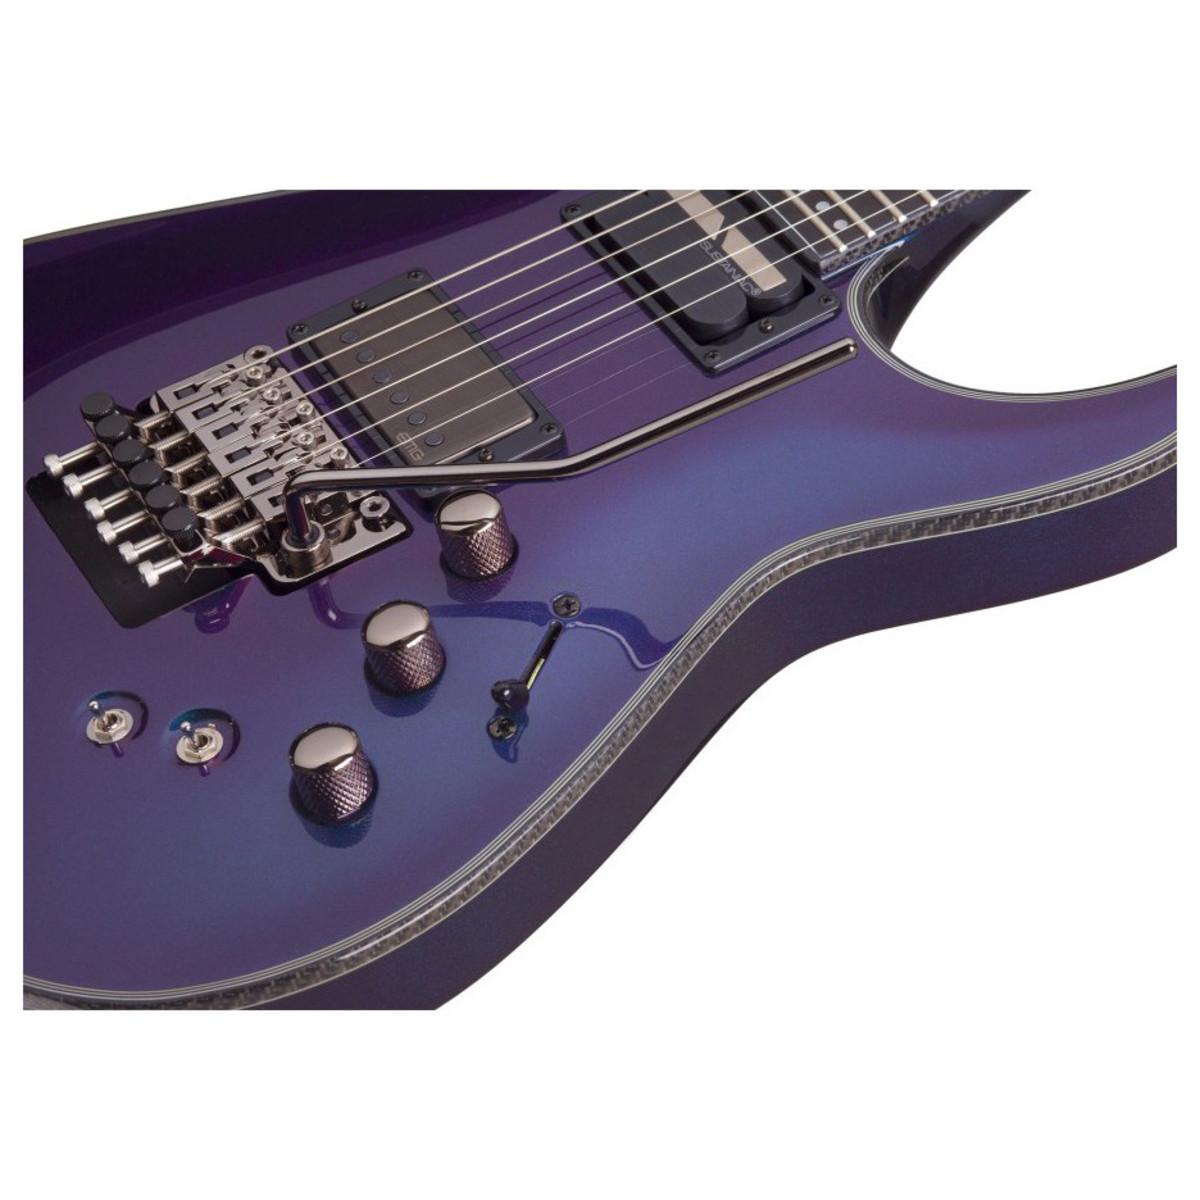 Schecter Hellraiser C 1 Fr S : schecter hellraiser hybrid c 1 fr s electric guitar ultra violet at gear4music ~ Russianpoet.info Haus und Dekorationen